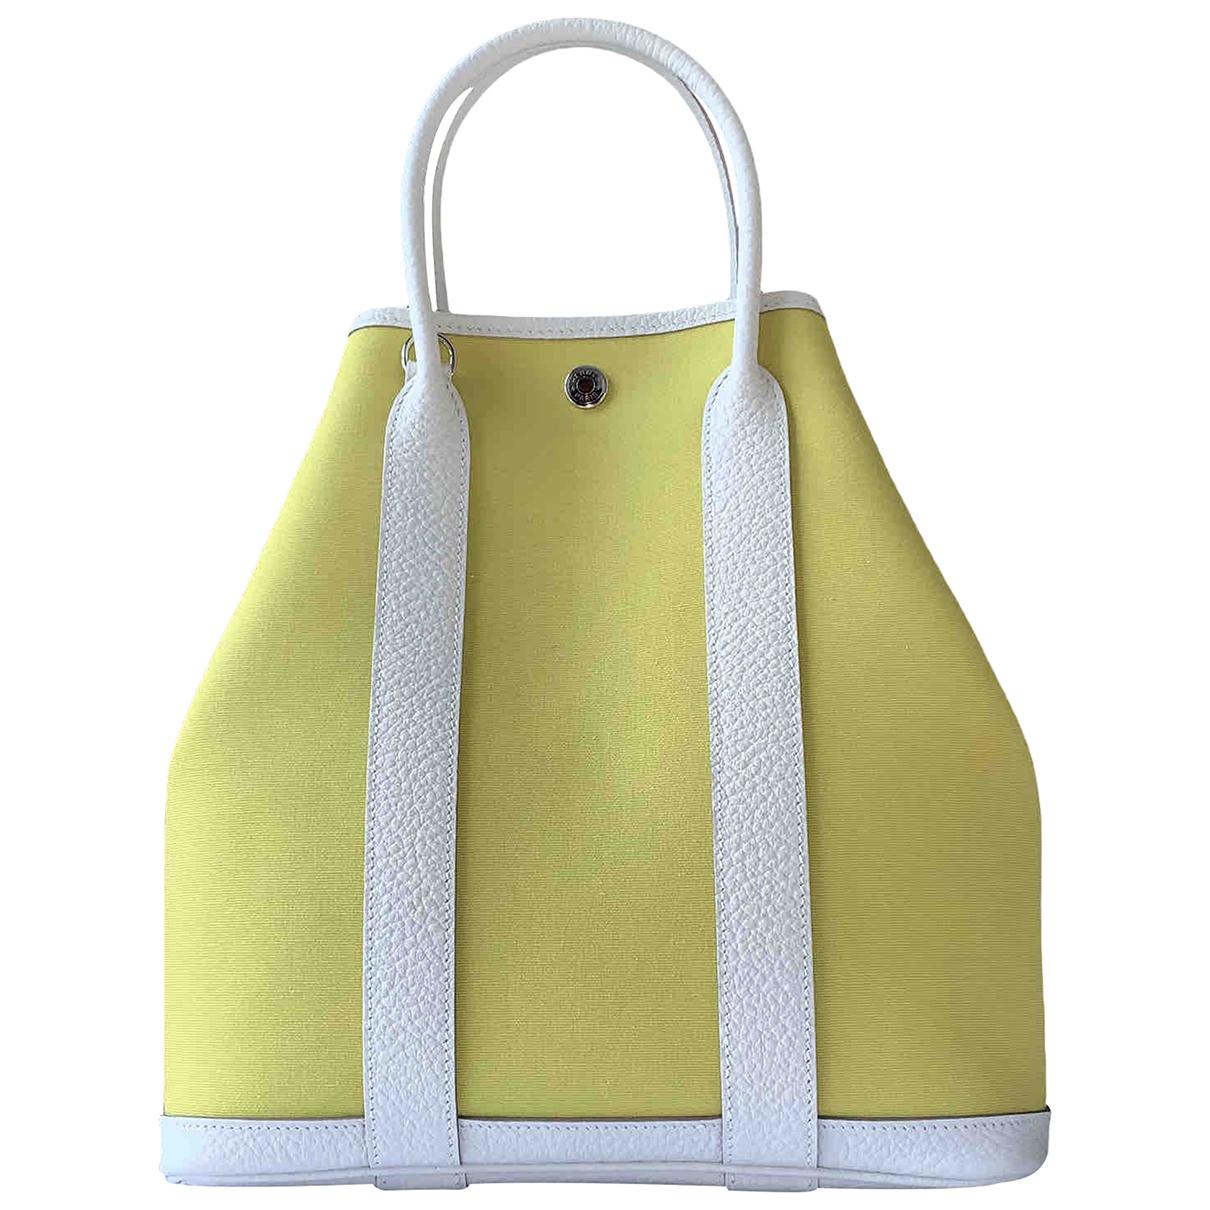 Hermès Garden Party Yellow Leather handbag for Women N